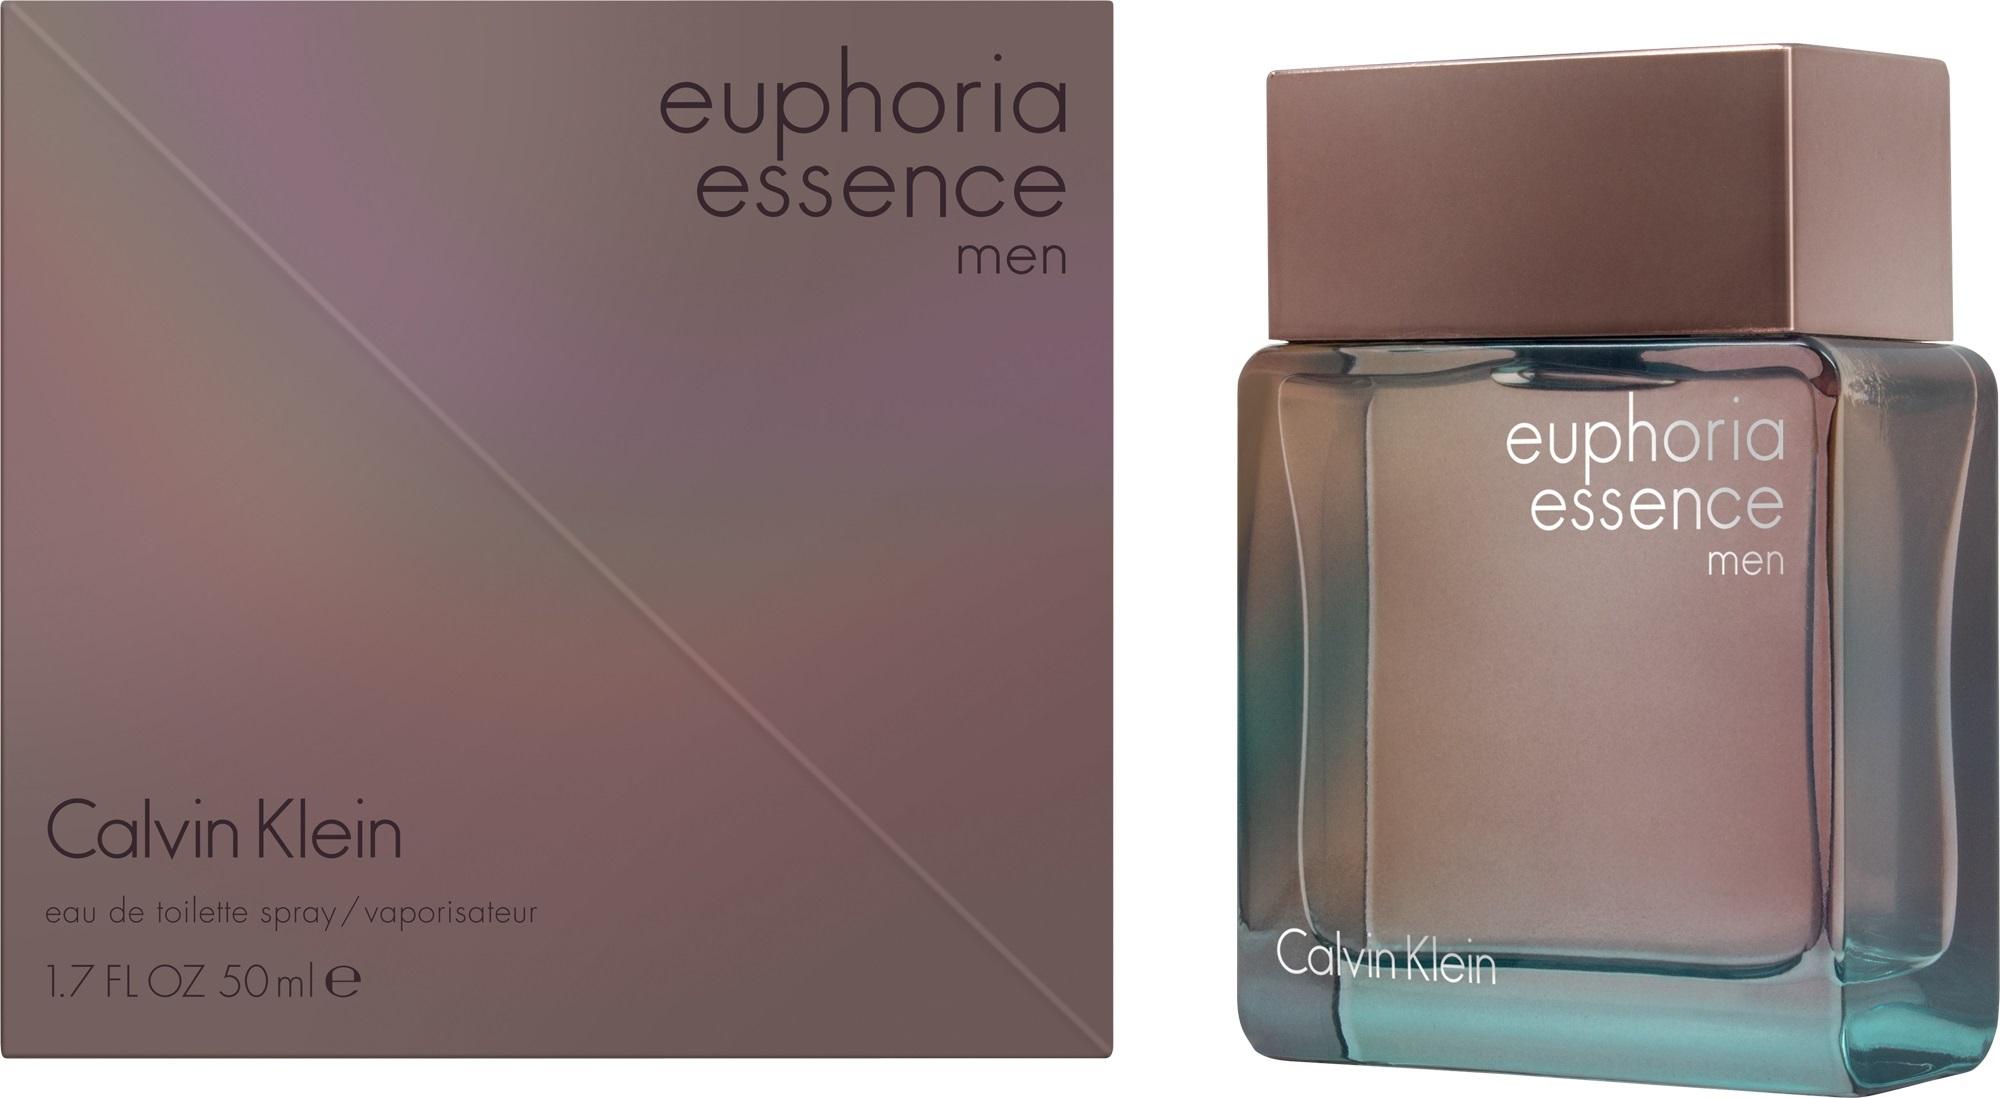 Fotografie Calvin Klein Euphoria Essence Men toaletní voda 50 ml